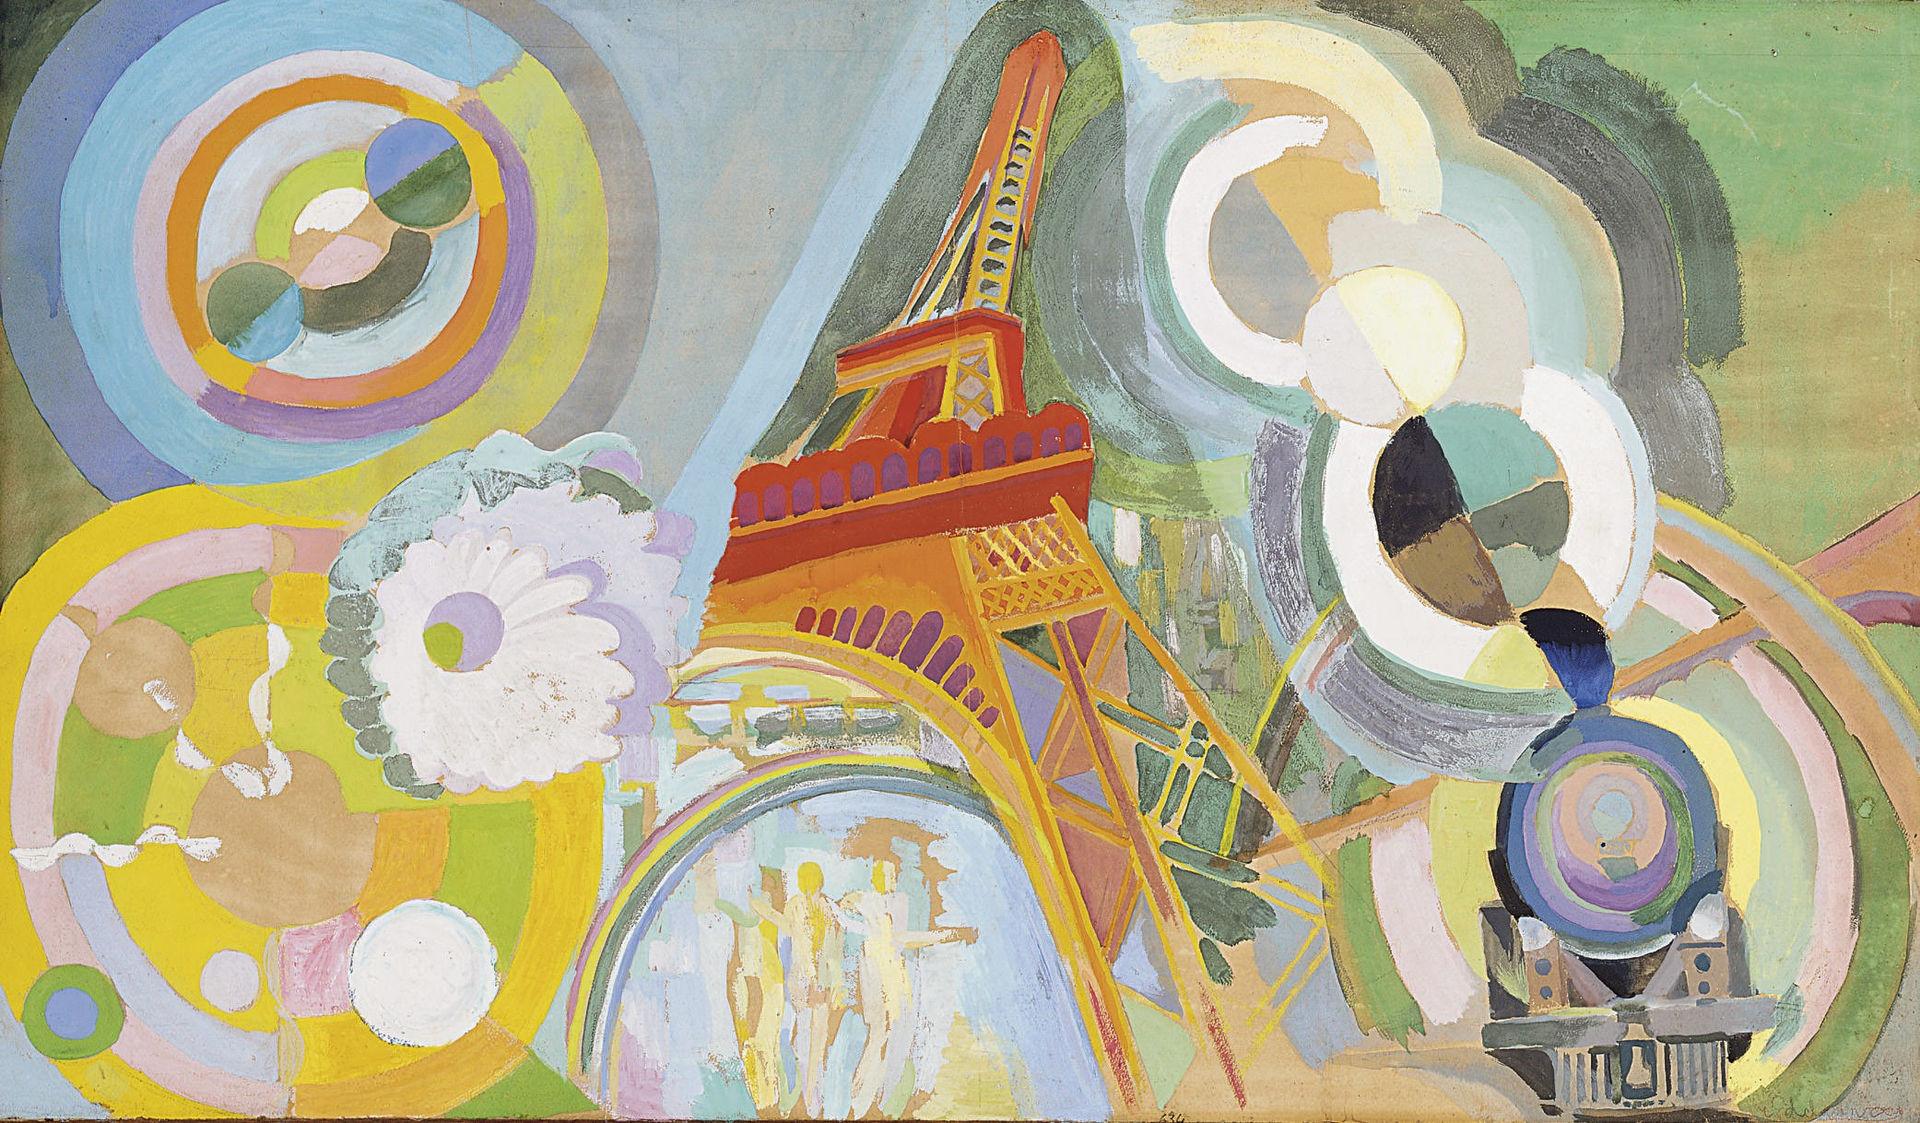 1920px Robert Delaunay Air fer et eau C3 A9tude 1937 Robert DELAUNAY und Paris